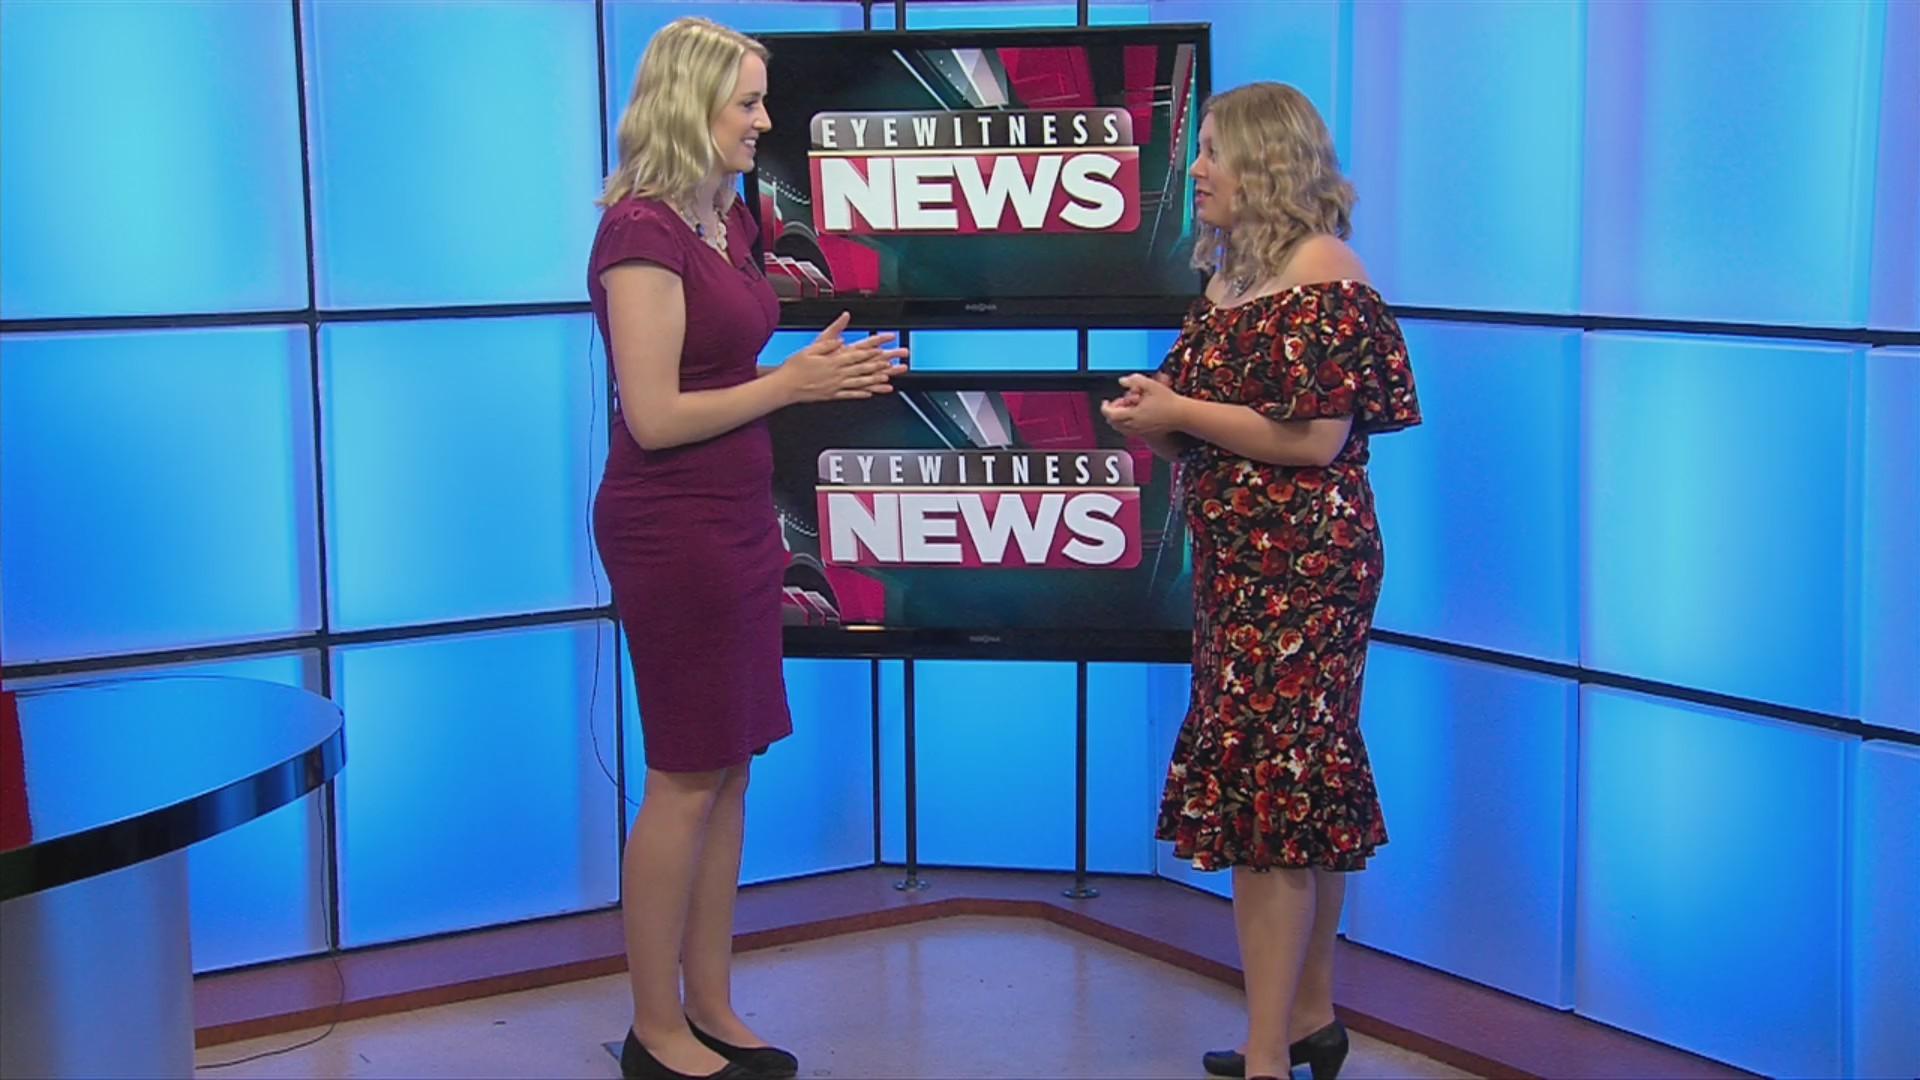 Dancing with Eyewitness News: Emily Waldron